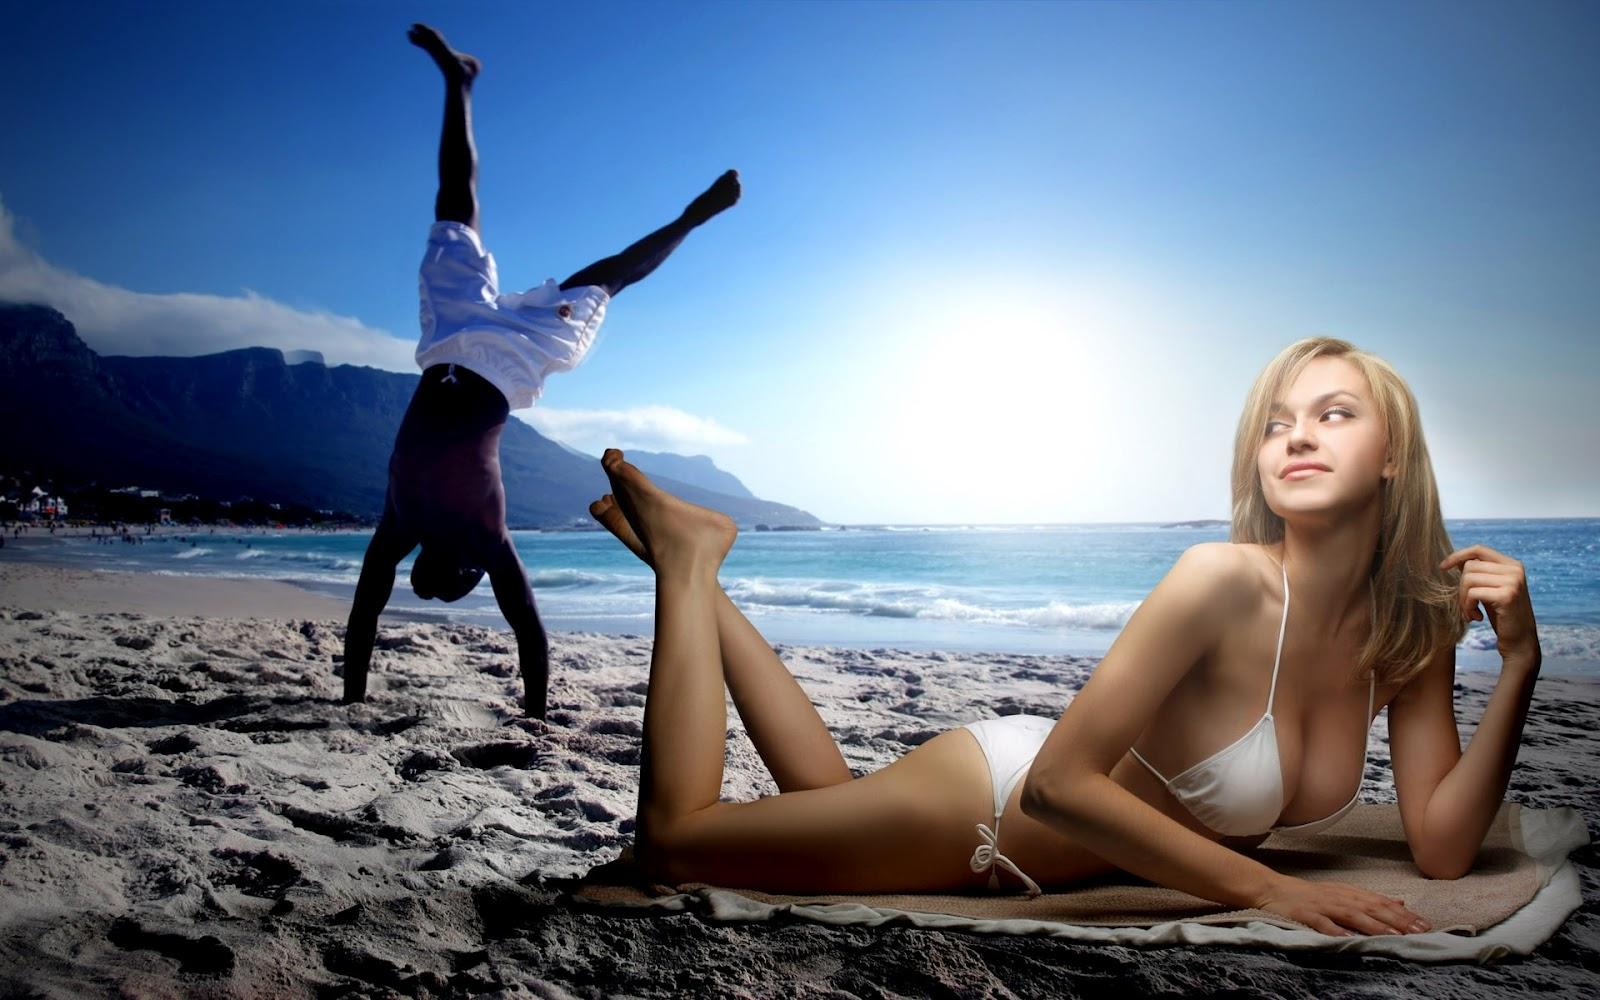 beach girls wallpapers photos - gallery- templates